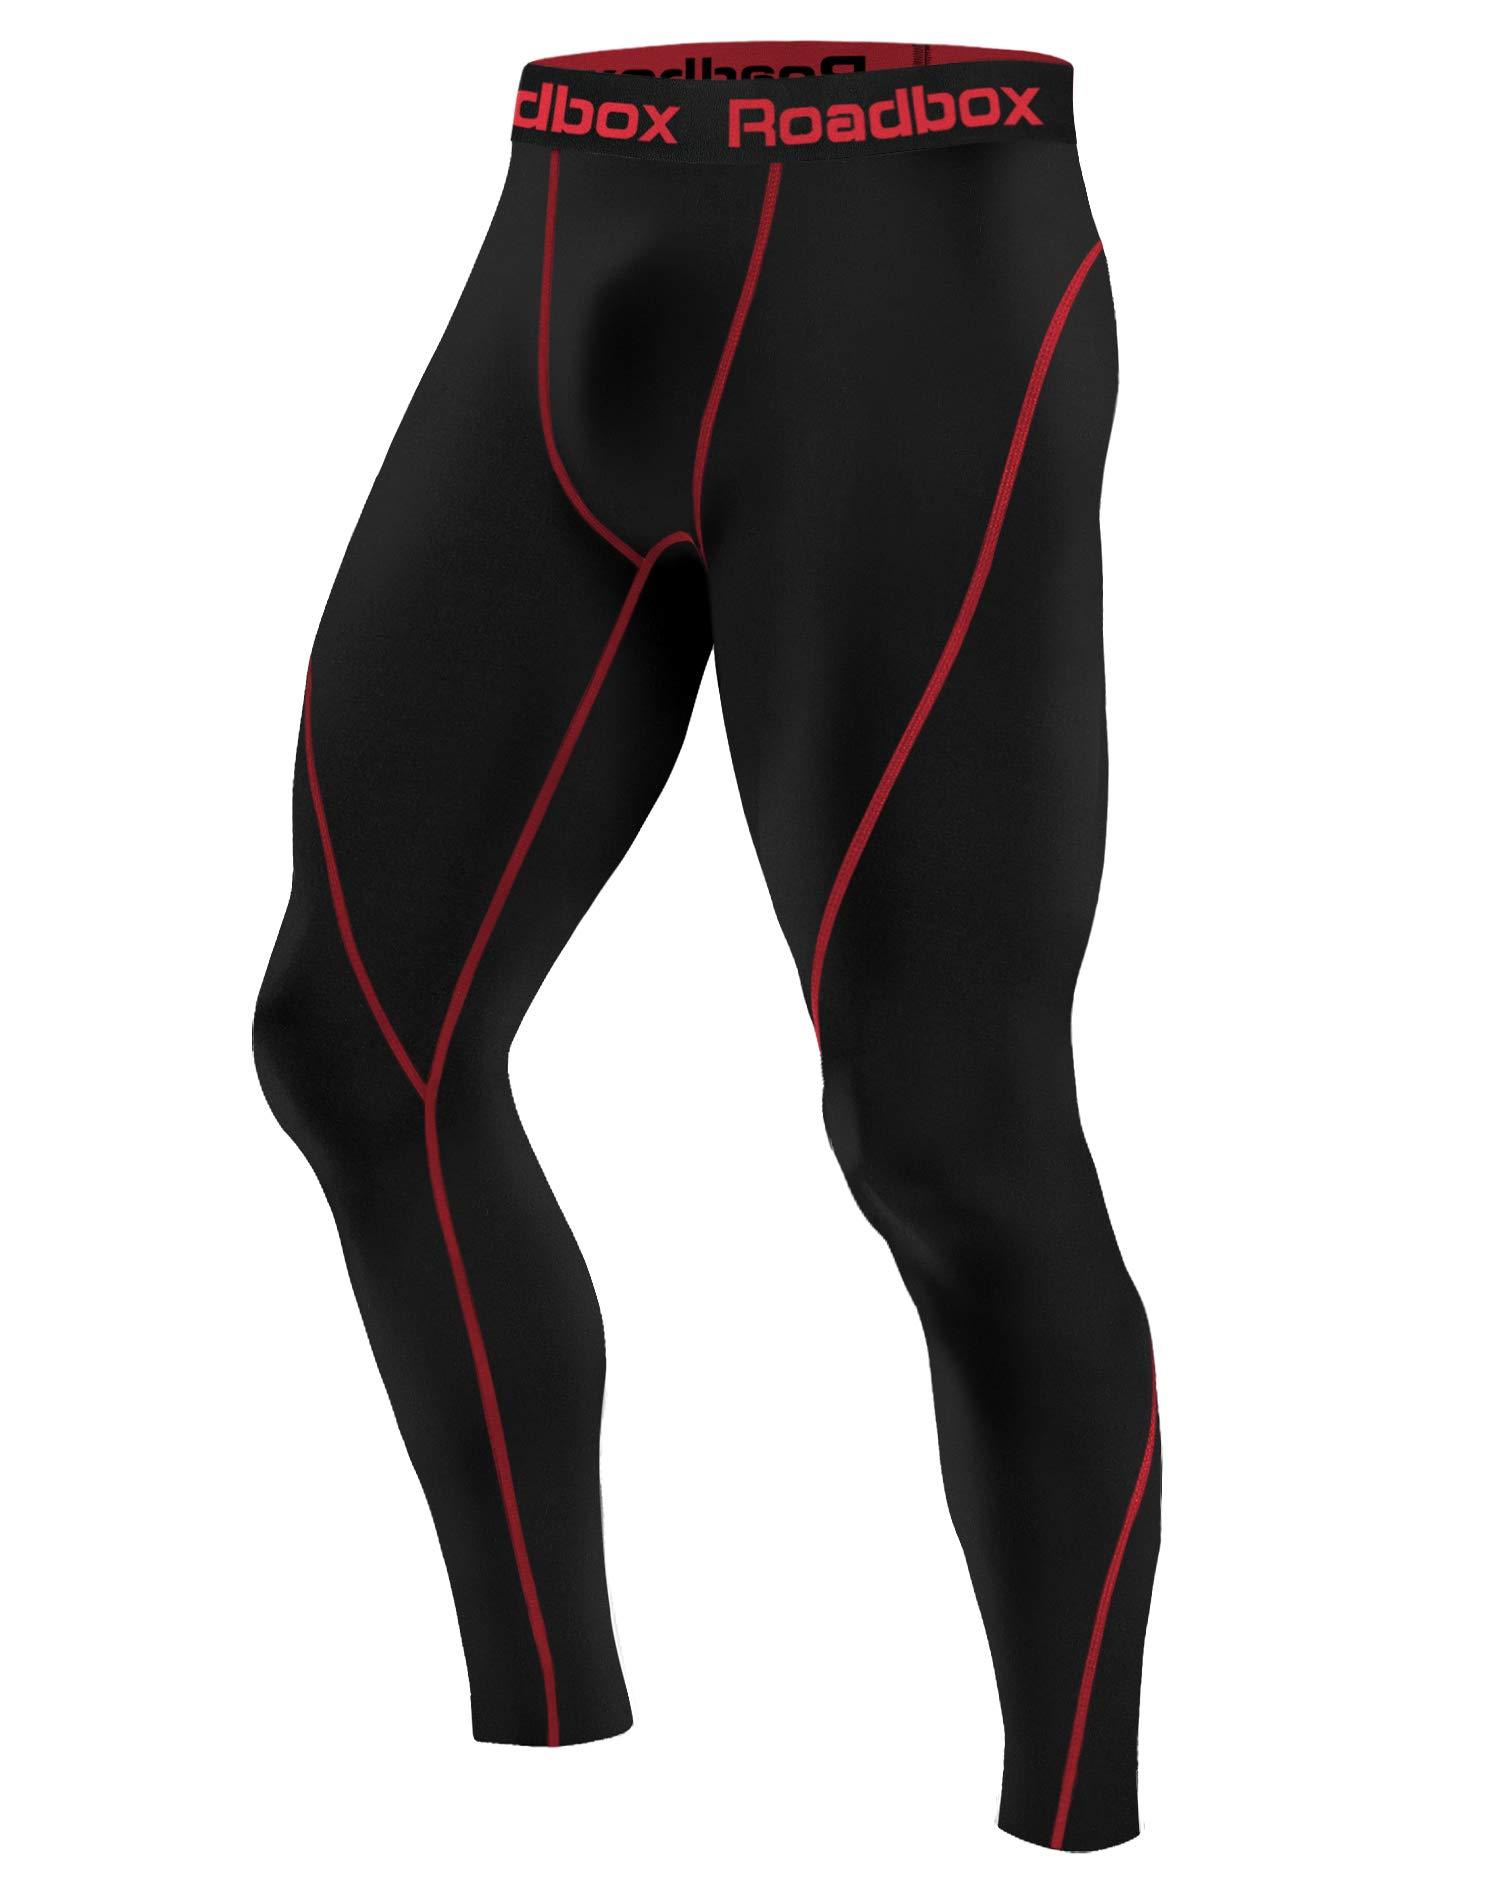 Roadbox Men's Compression Pants Base Layer Cool Dry